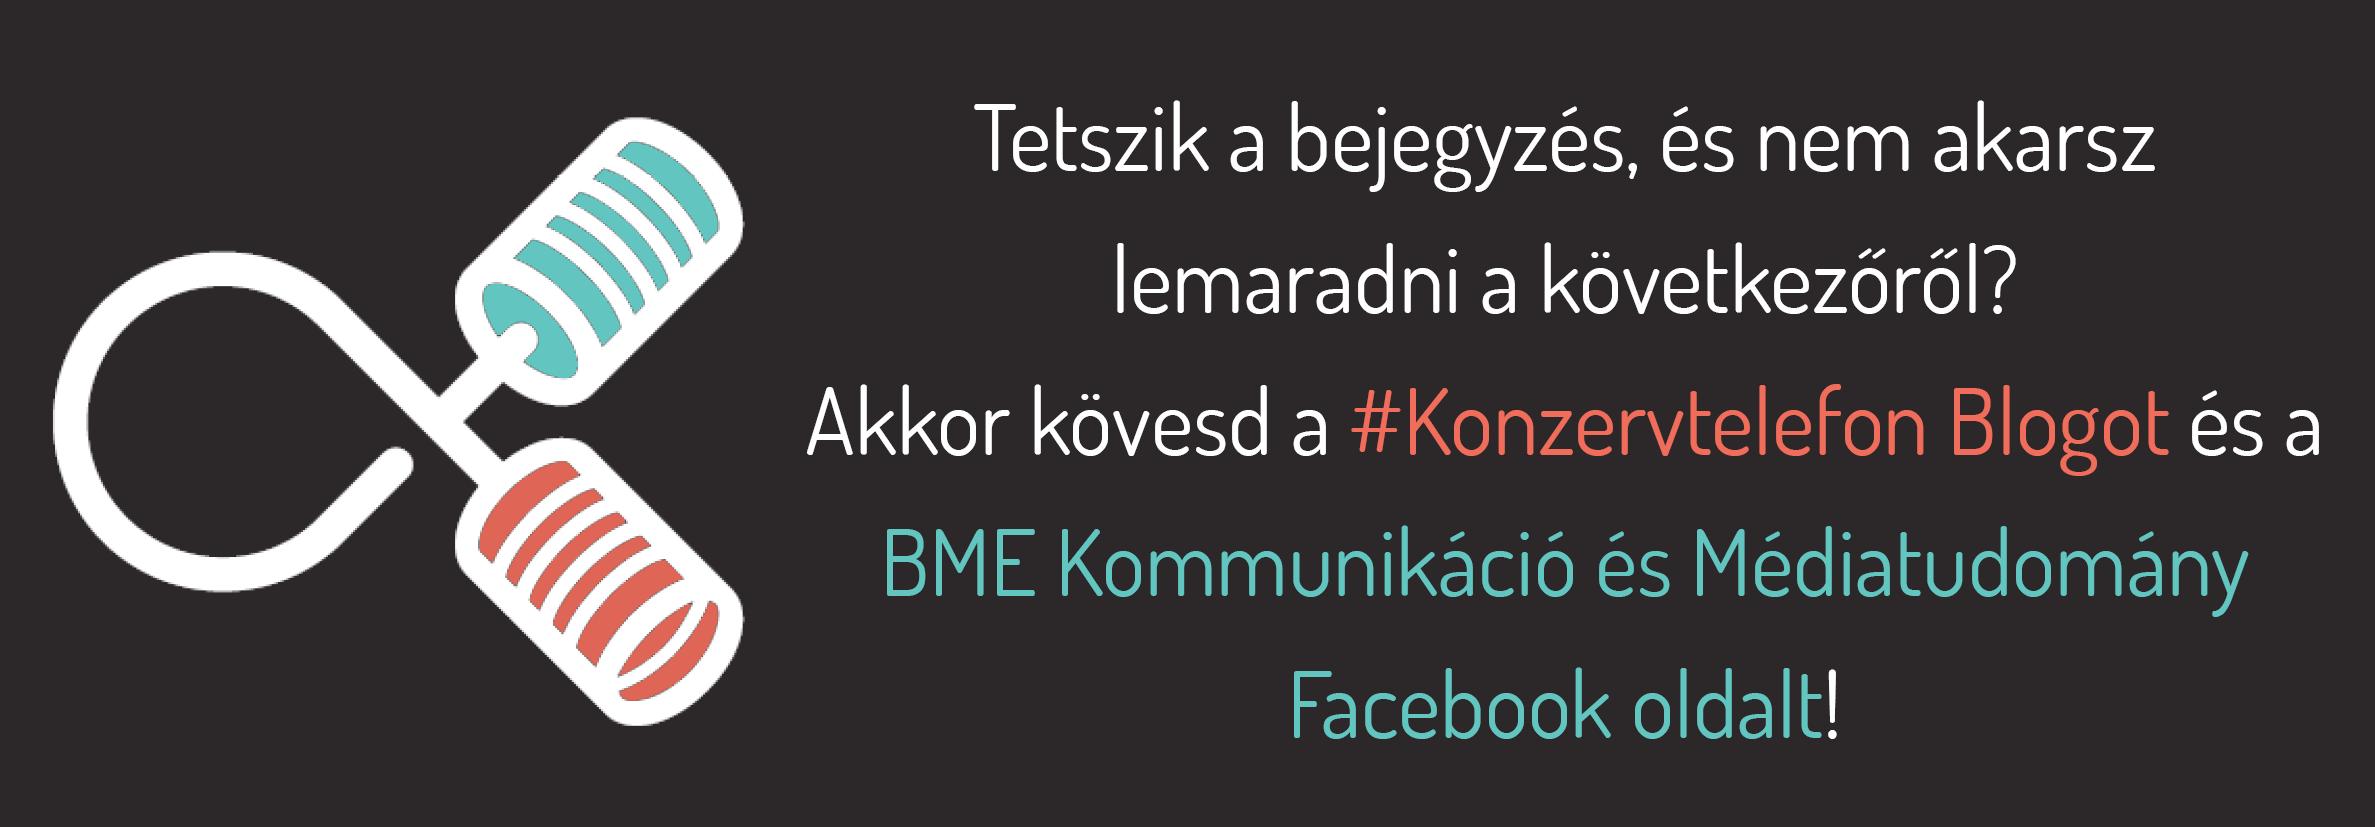 kep_1.png